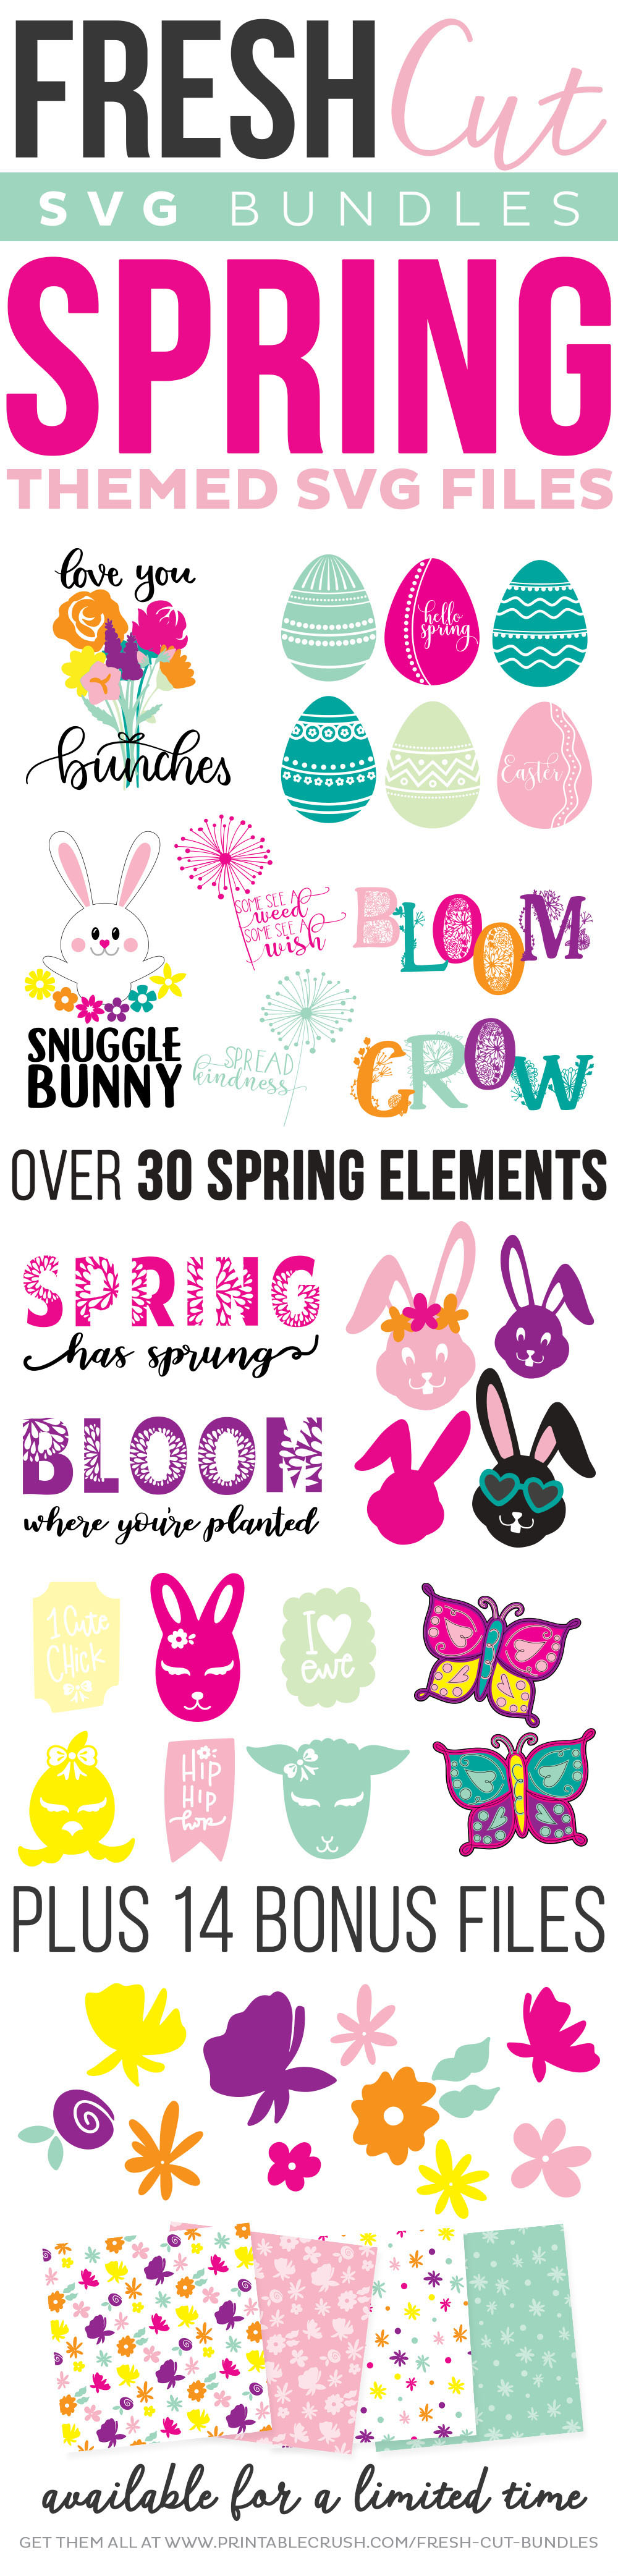 Get the Spring Fresh Cut SVG Bundle! Over 30 elements, plus 14 bonus files!